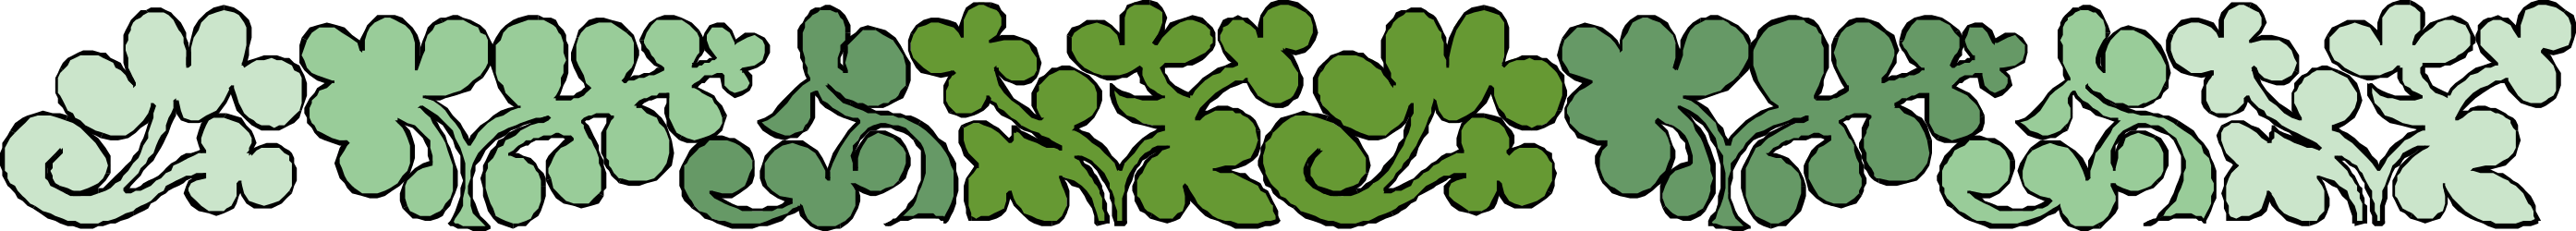 BORDERS,PLANTS,BRTP0060 clipart